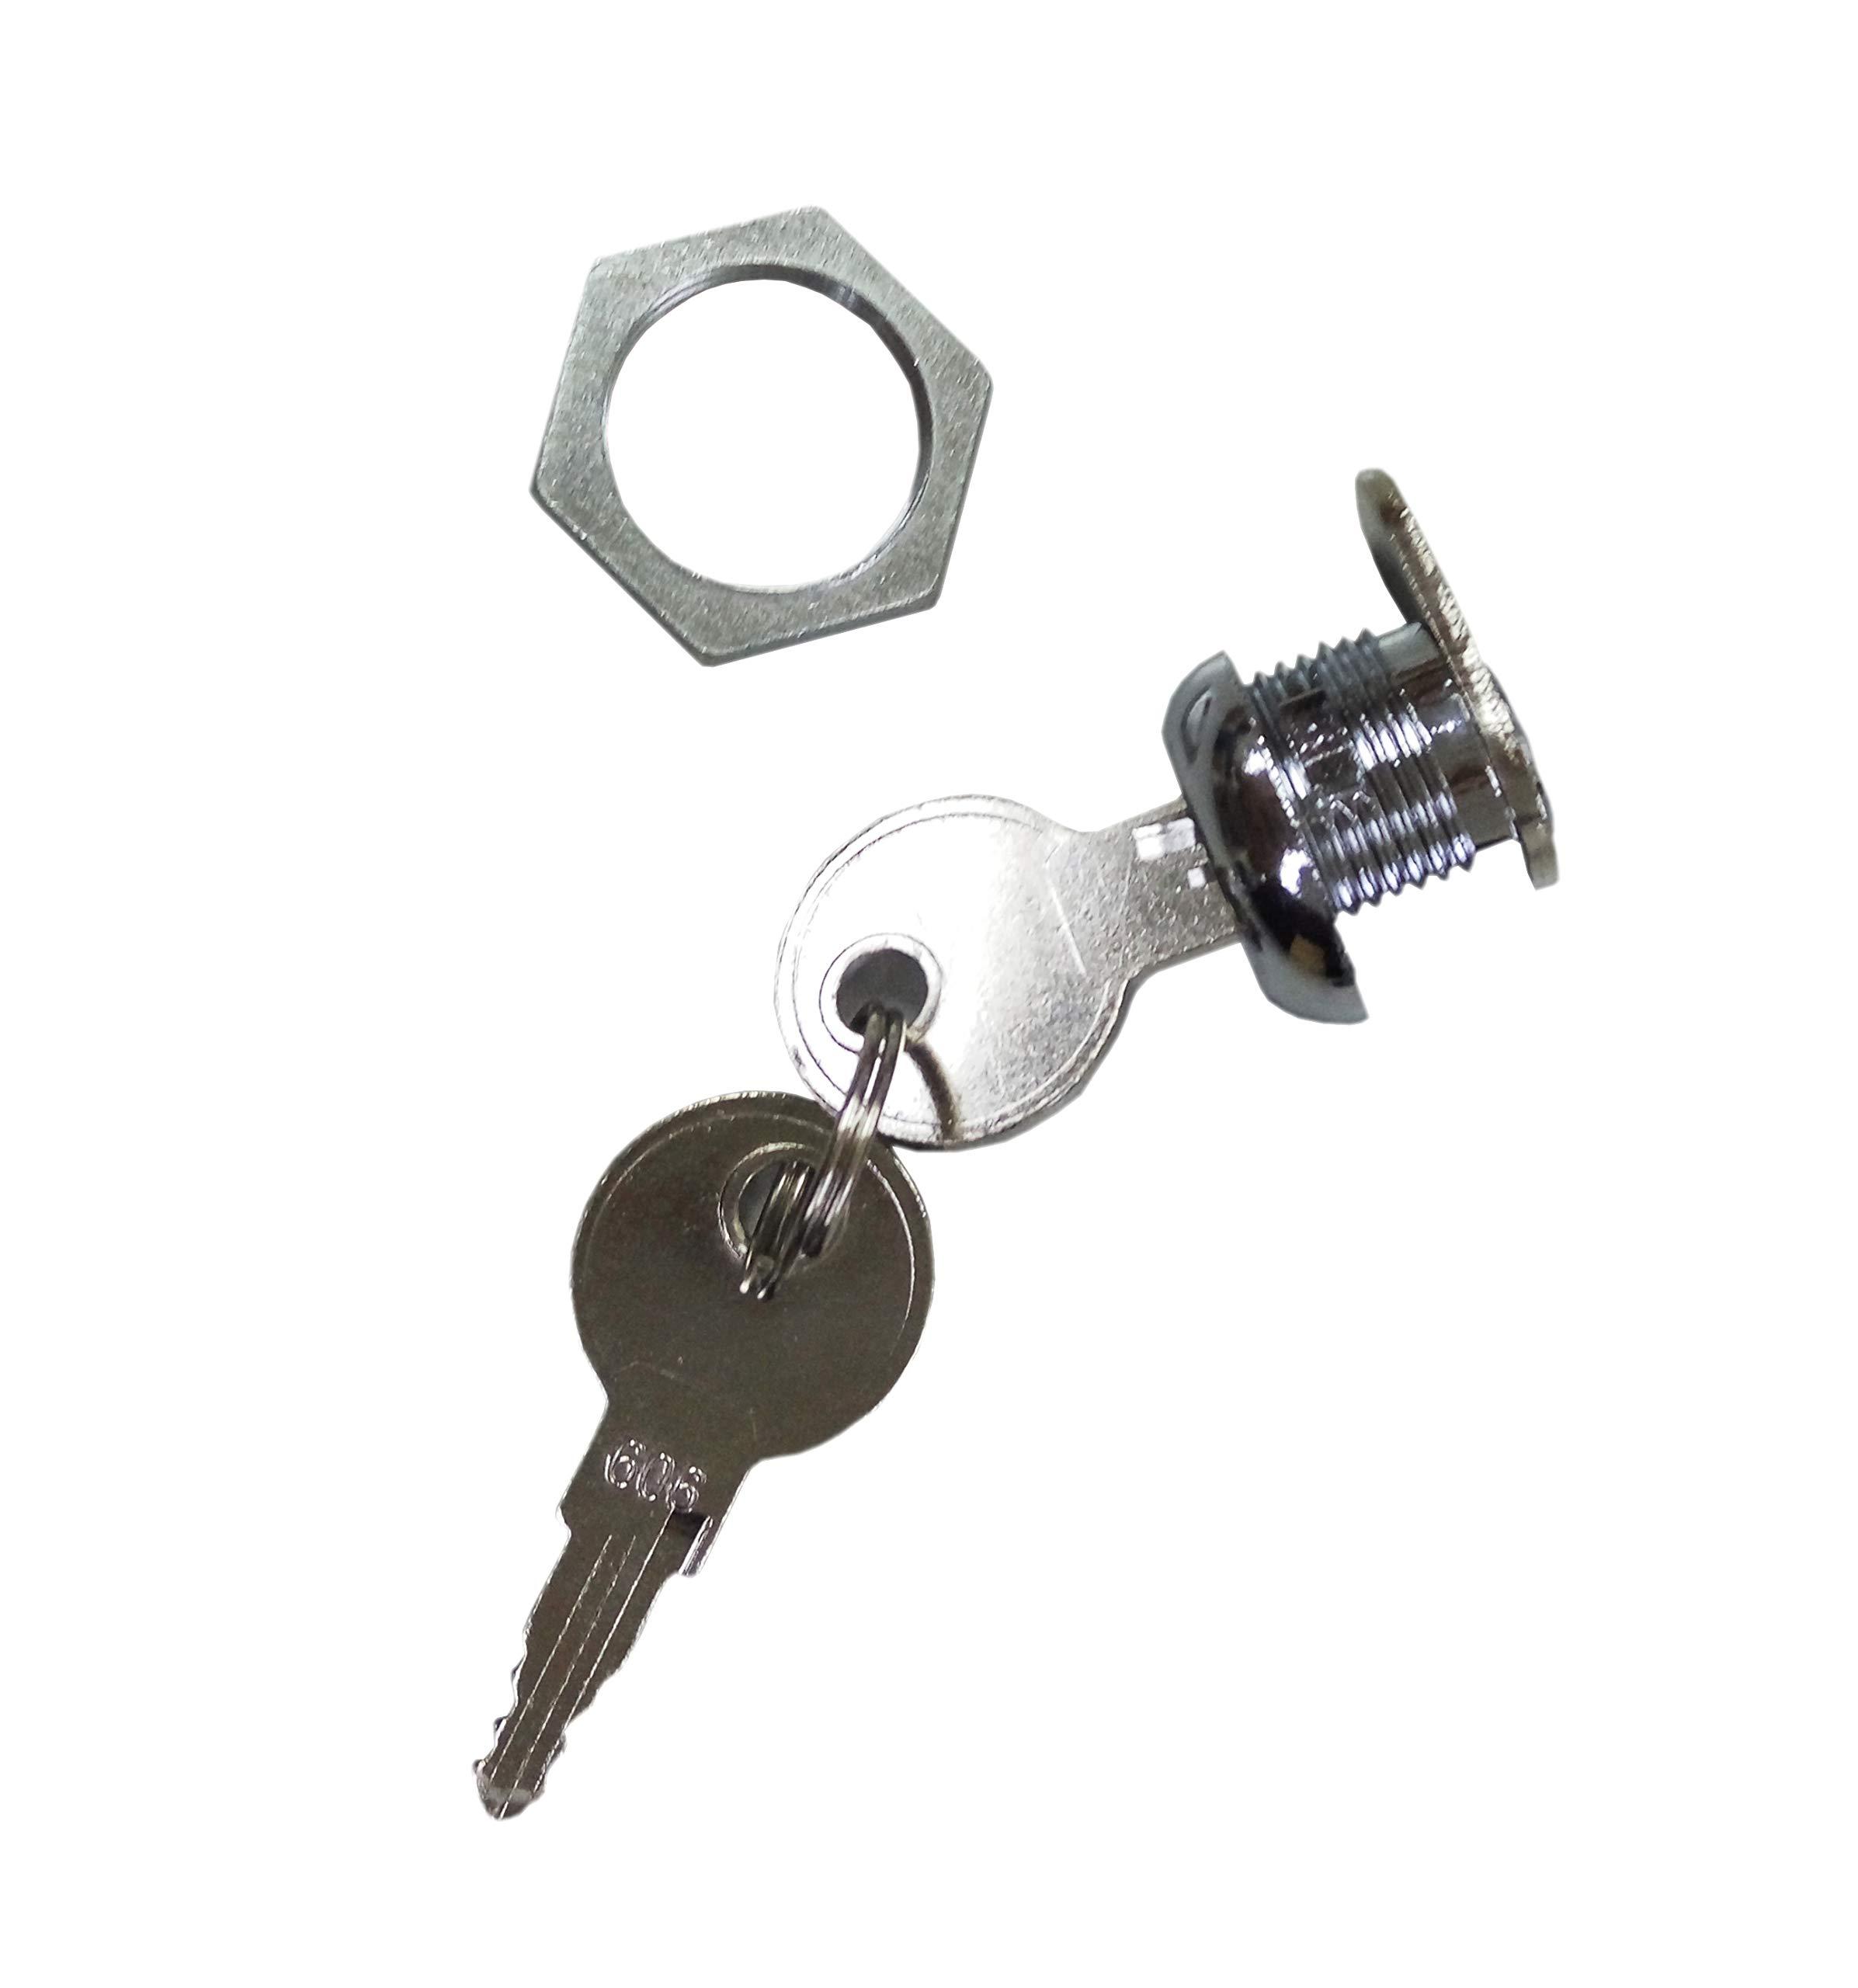 FixtureDisplays Cam Lock for Cellphone Locker Suggestion Fundraising Donation Box 18235 by FixtureDisplays